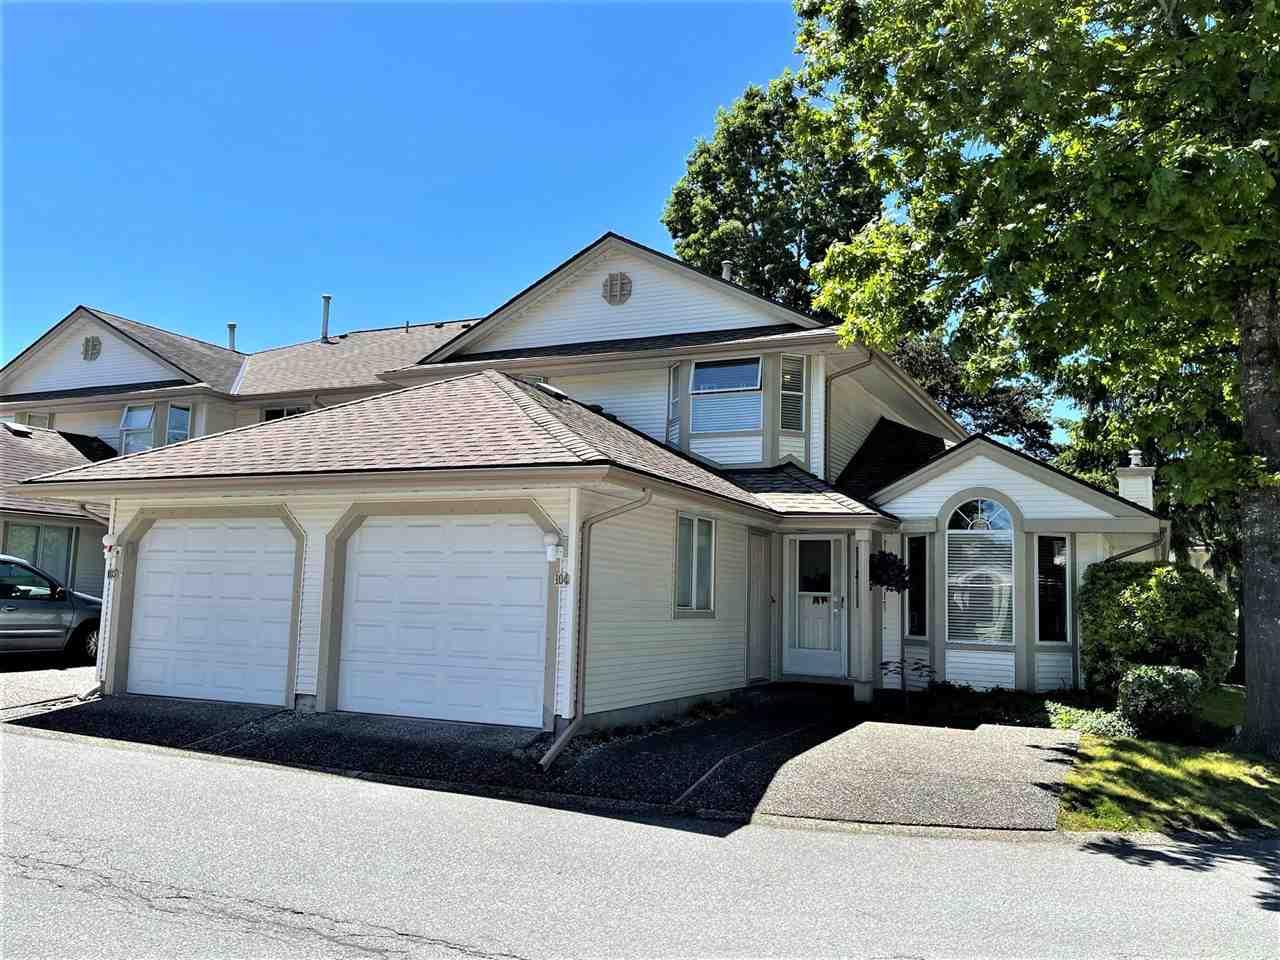 104 9045 WALNUT GROVE DRIVE - Walnut Grove Townhouse for sale, 3 Bedrooms (R2588351) #39